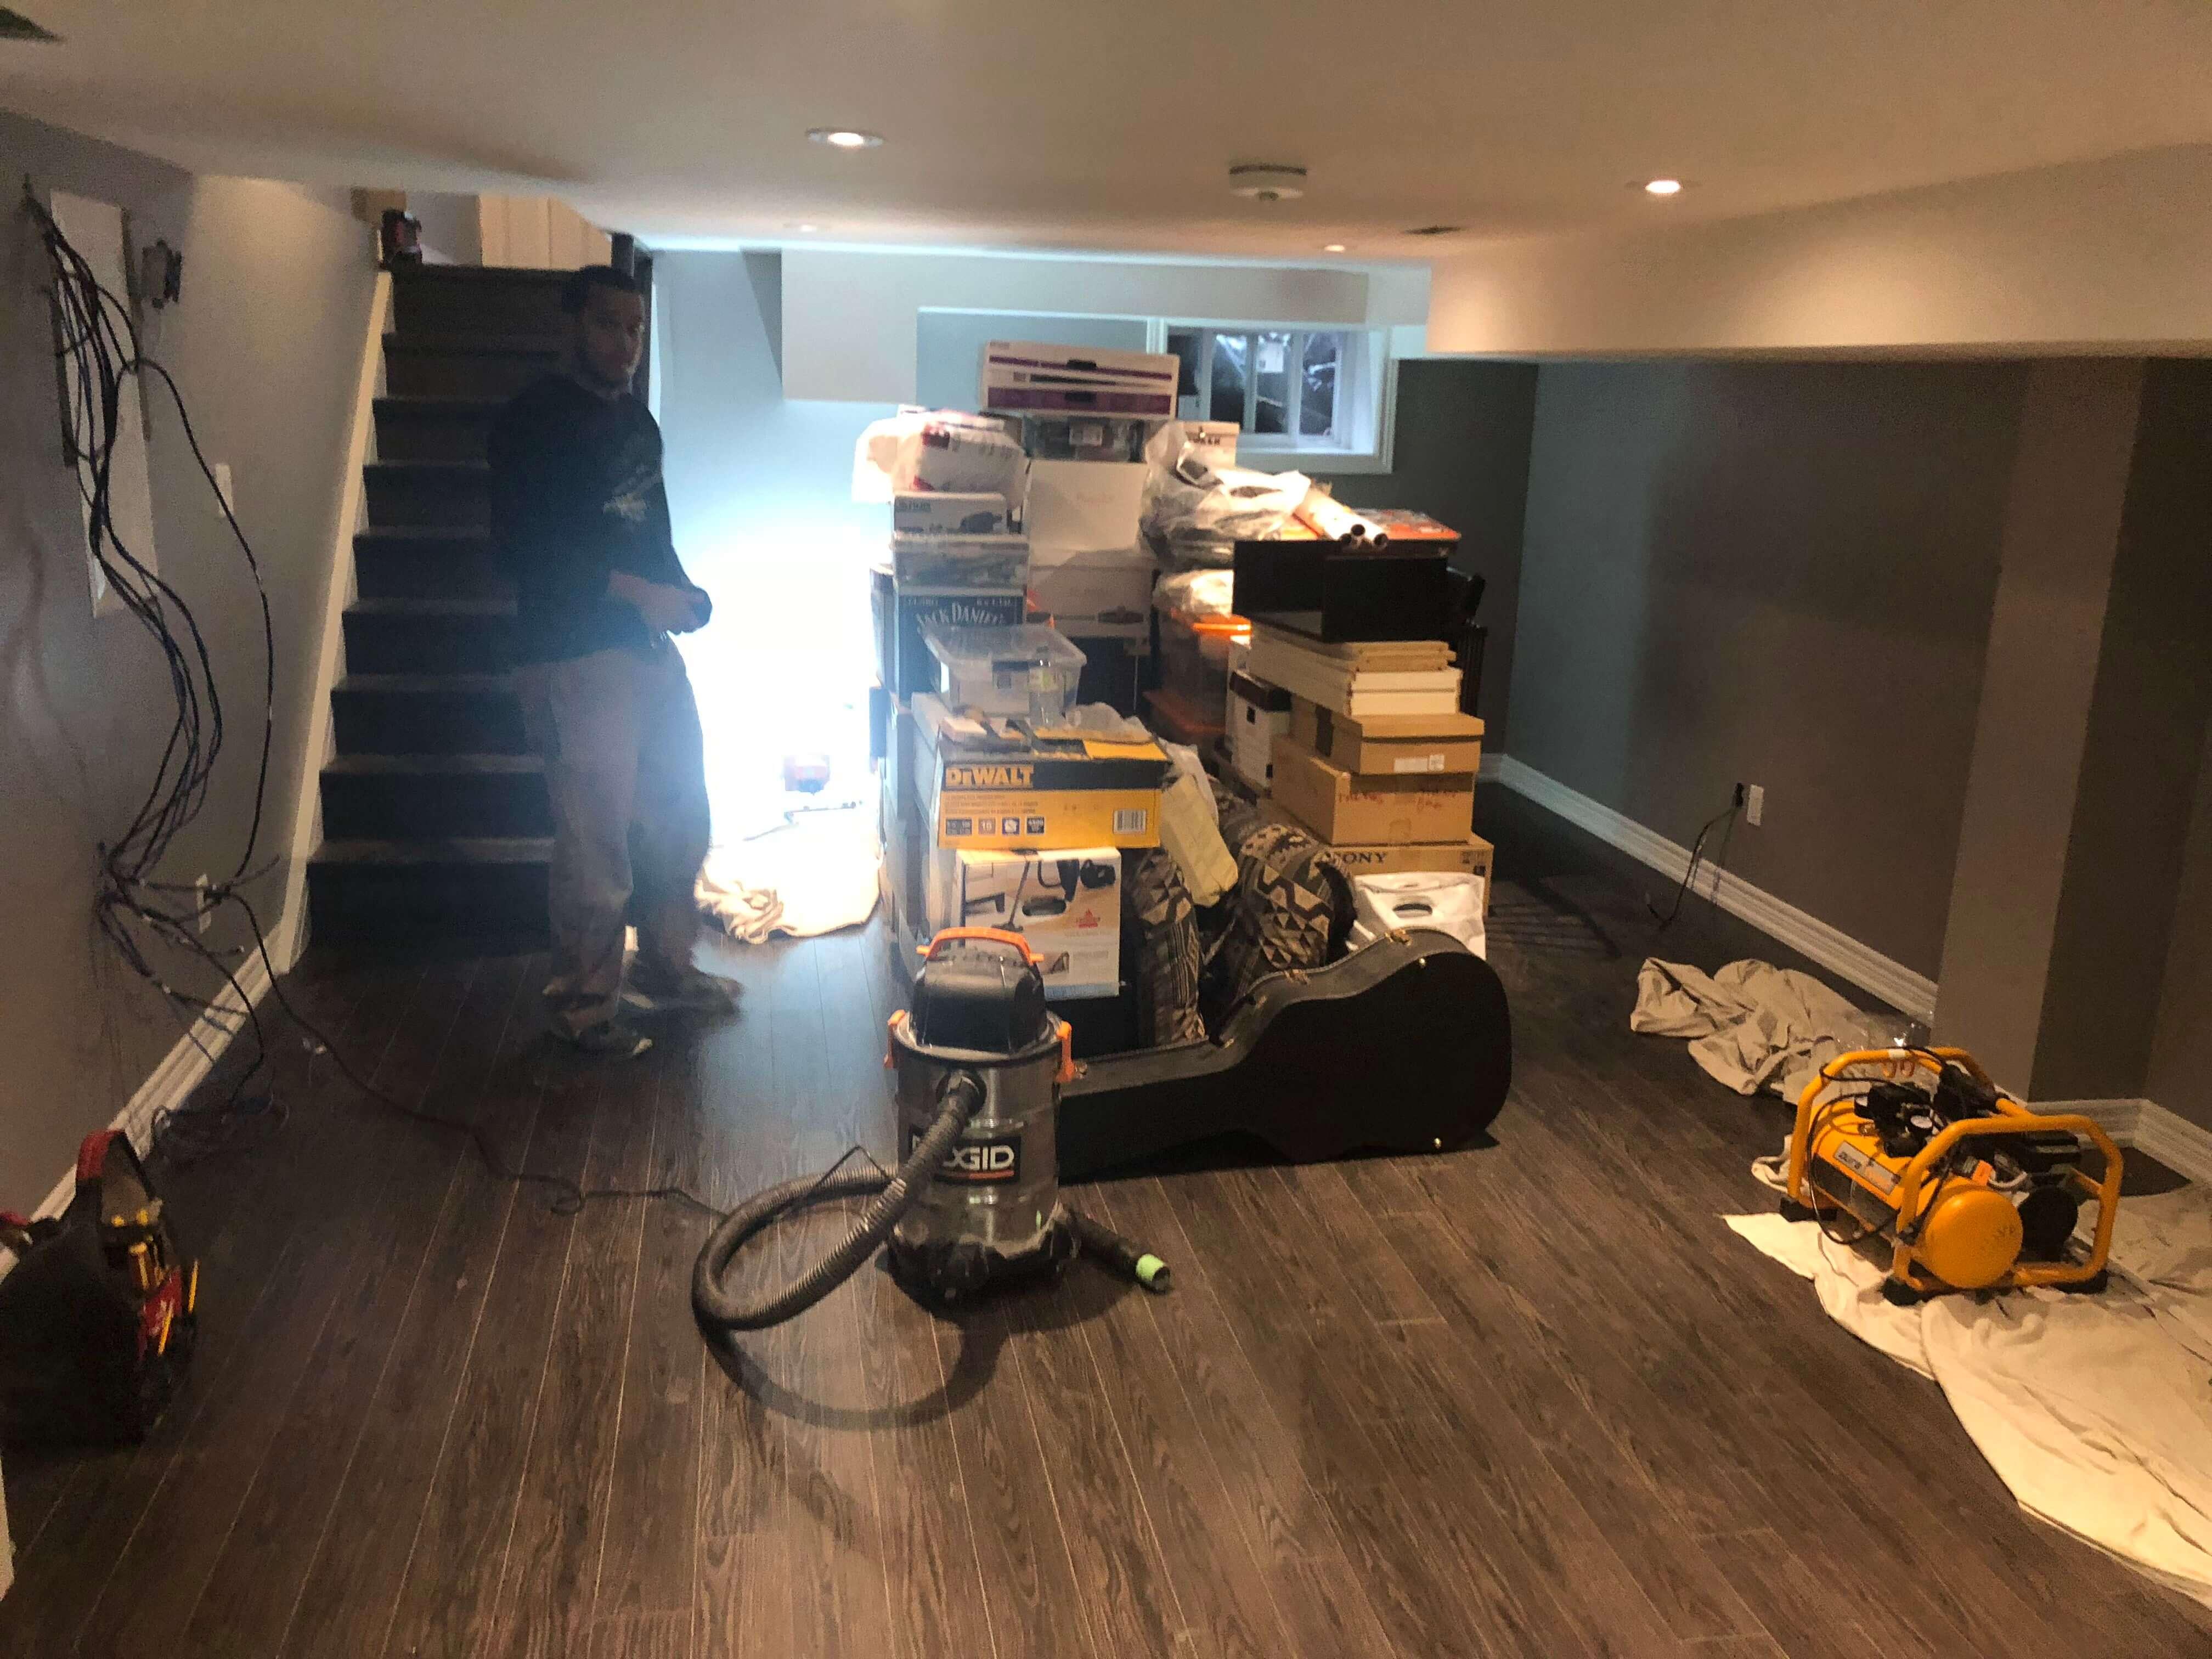 Home-Renovation-Company-Toronto-Strathmore-Blvd-5